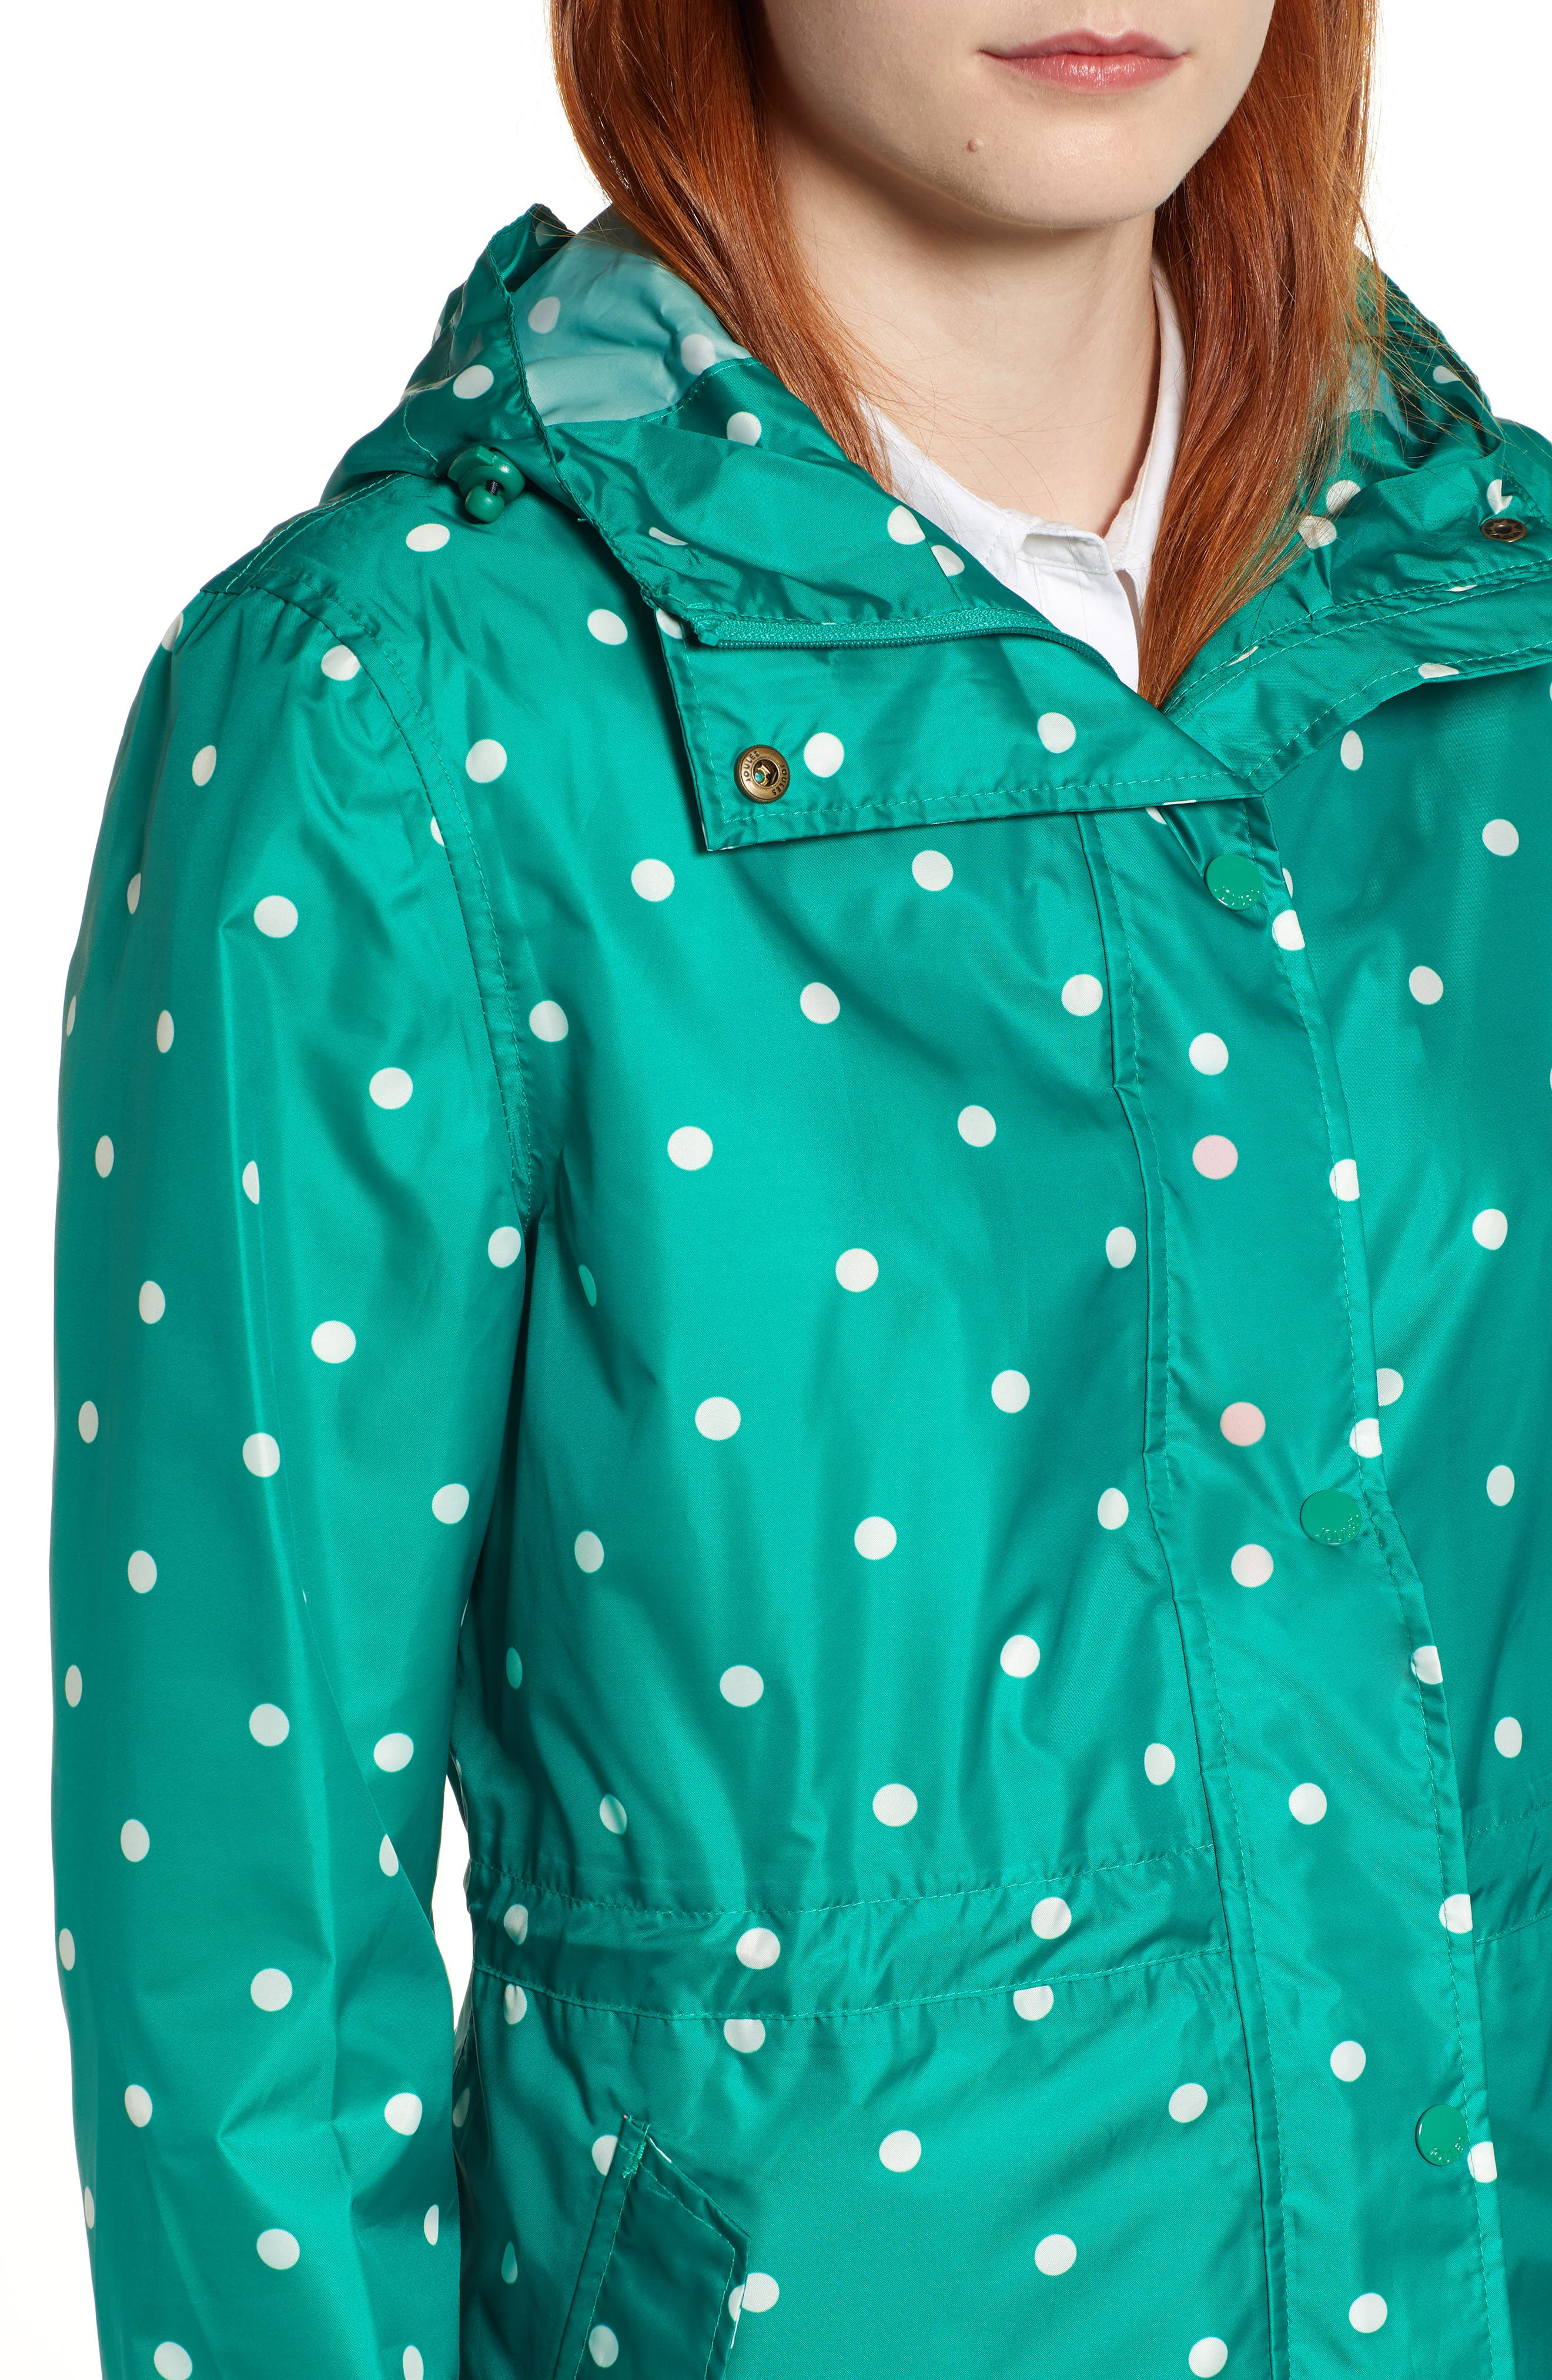 Go Lightly Waterproof Pack Away Hooded Jacket,                             Alternate thumbnail 4, color,                             GREEN SPOT